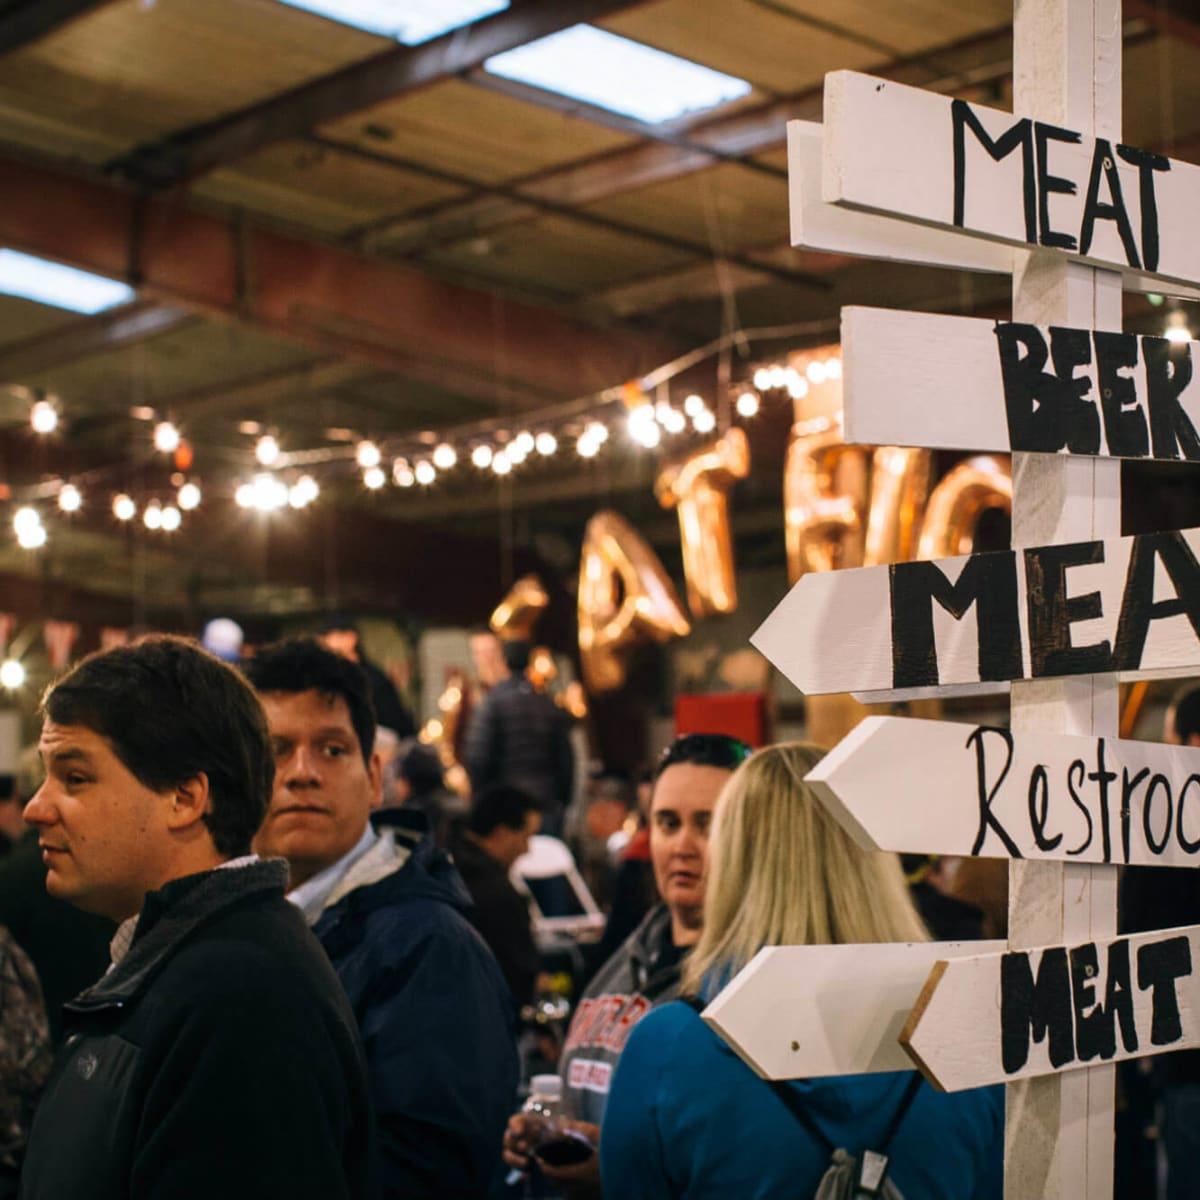 Meat Fight 2014